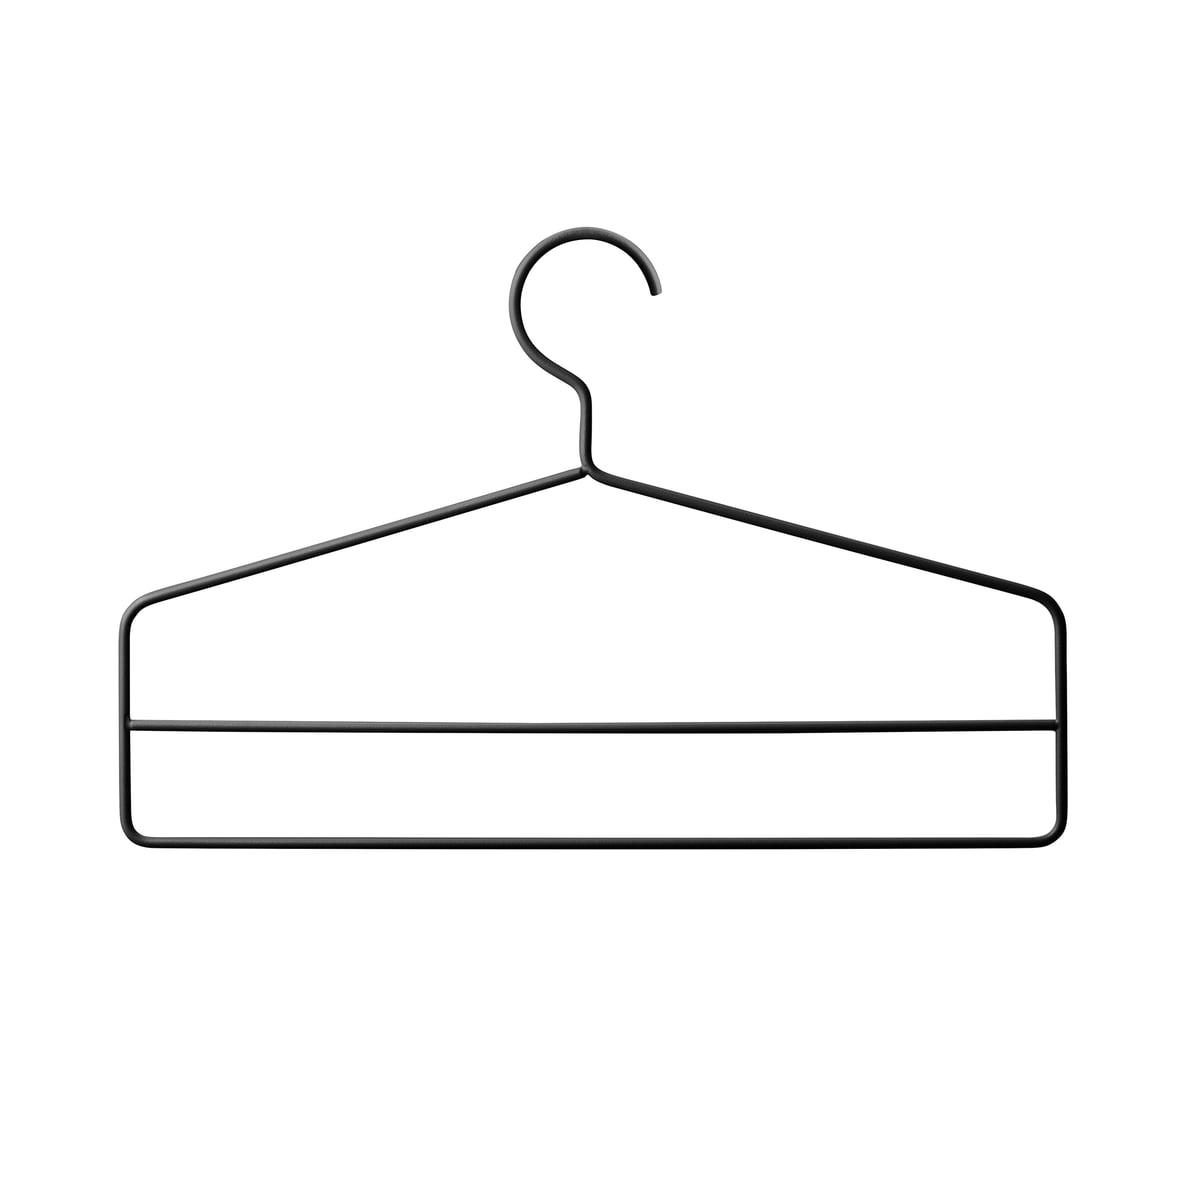 String - Kleiderbügel, schwarz (4er-Set)   Flur & Diele > Garderoben > Kleiderbügel   String